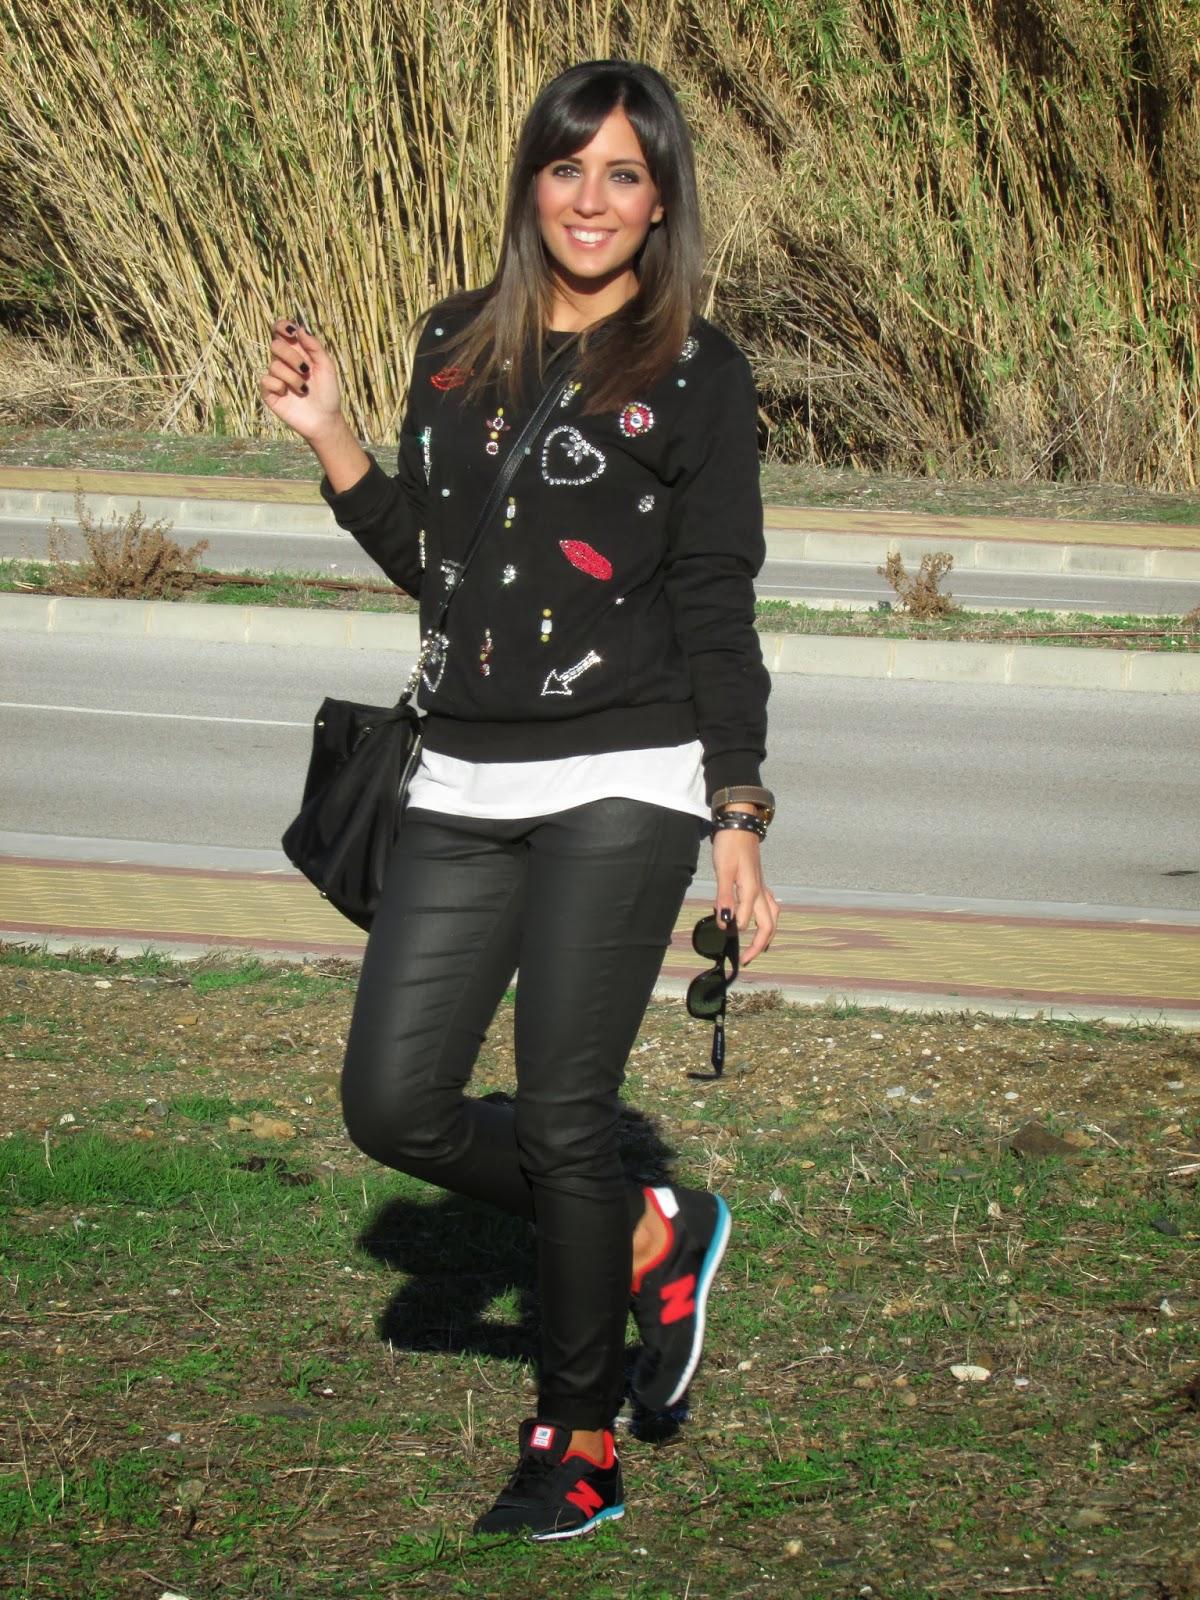 cristina style ootd street style fashion blogger blogger malaga malagueña tendencias moda outfit look zara inspiration